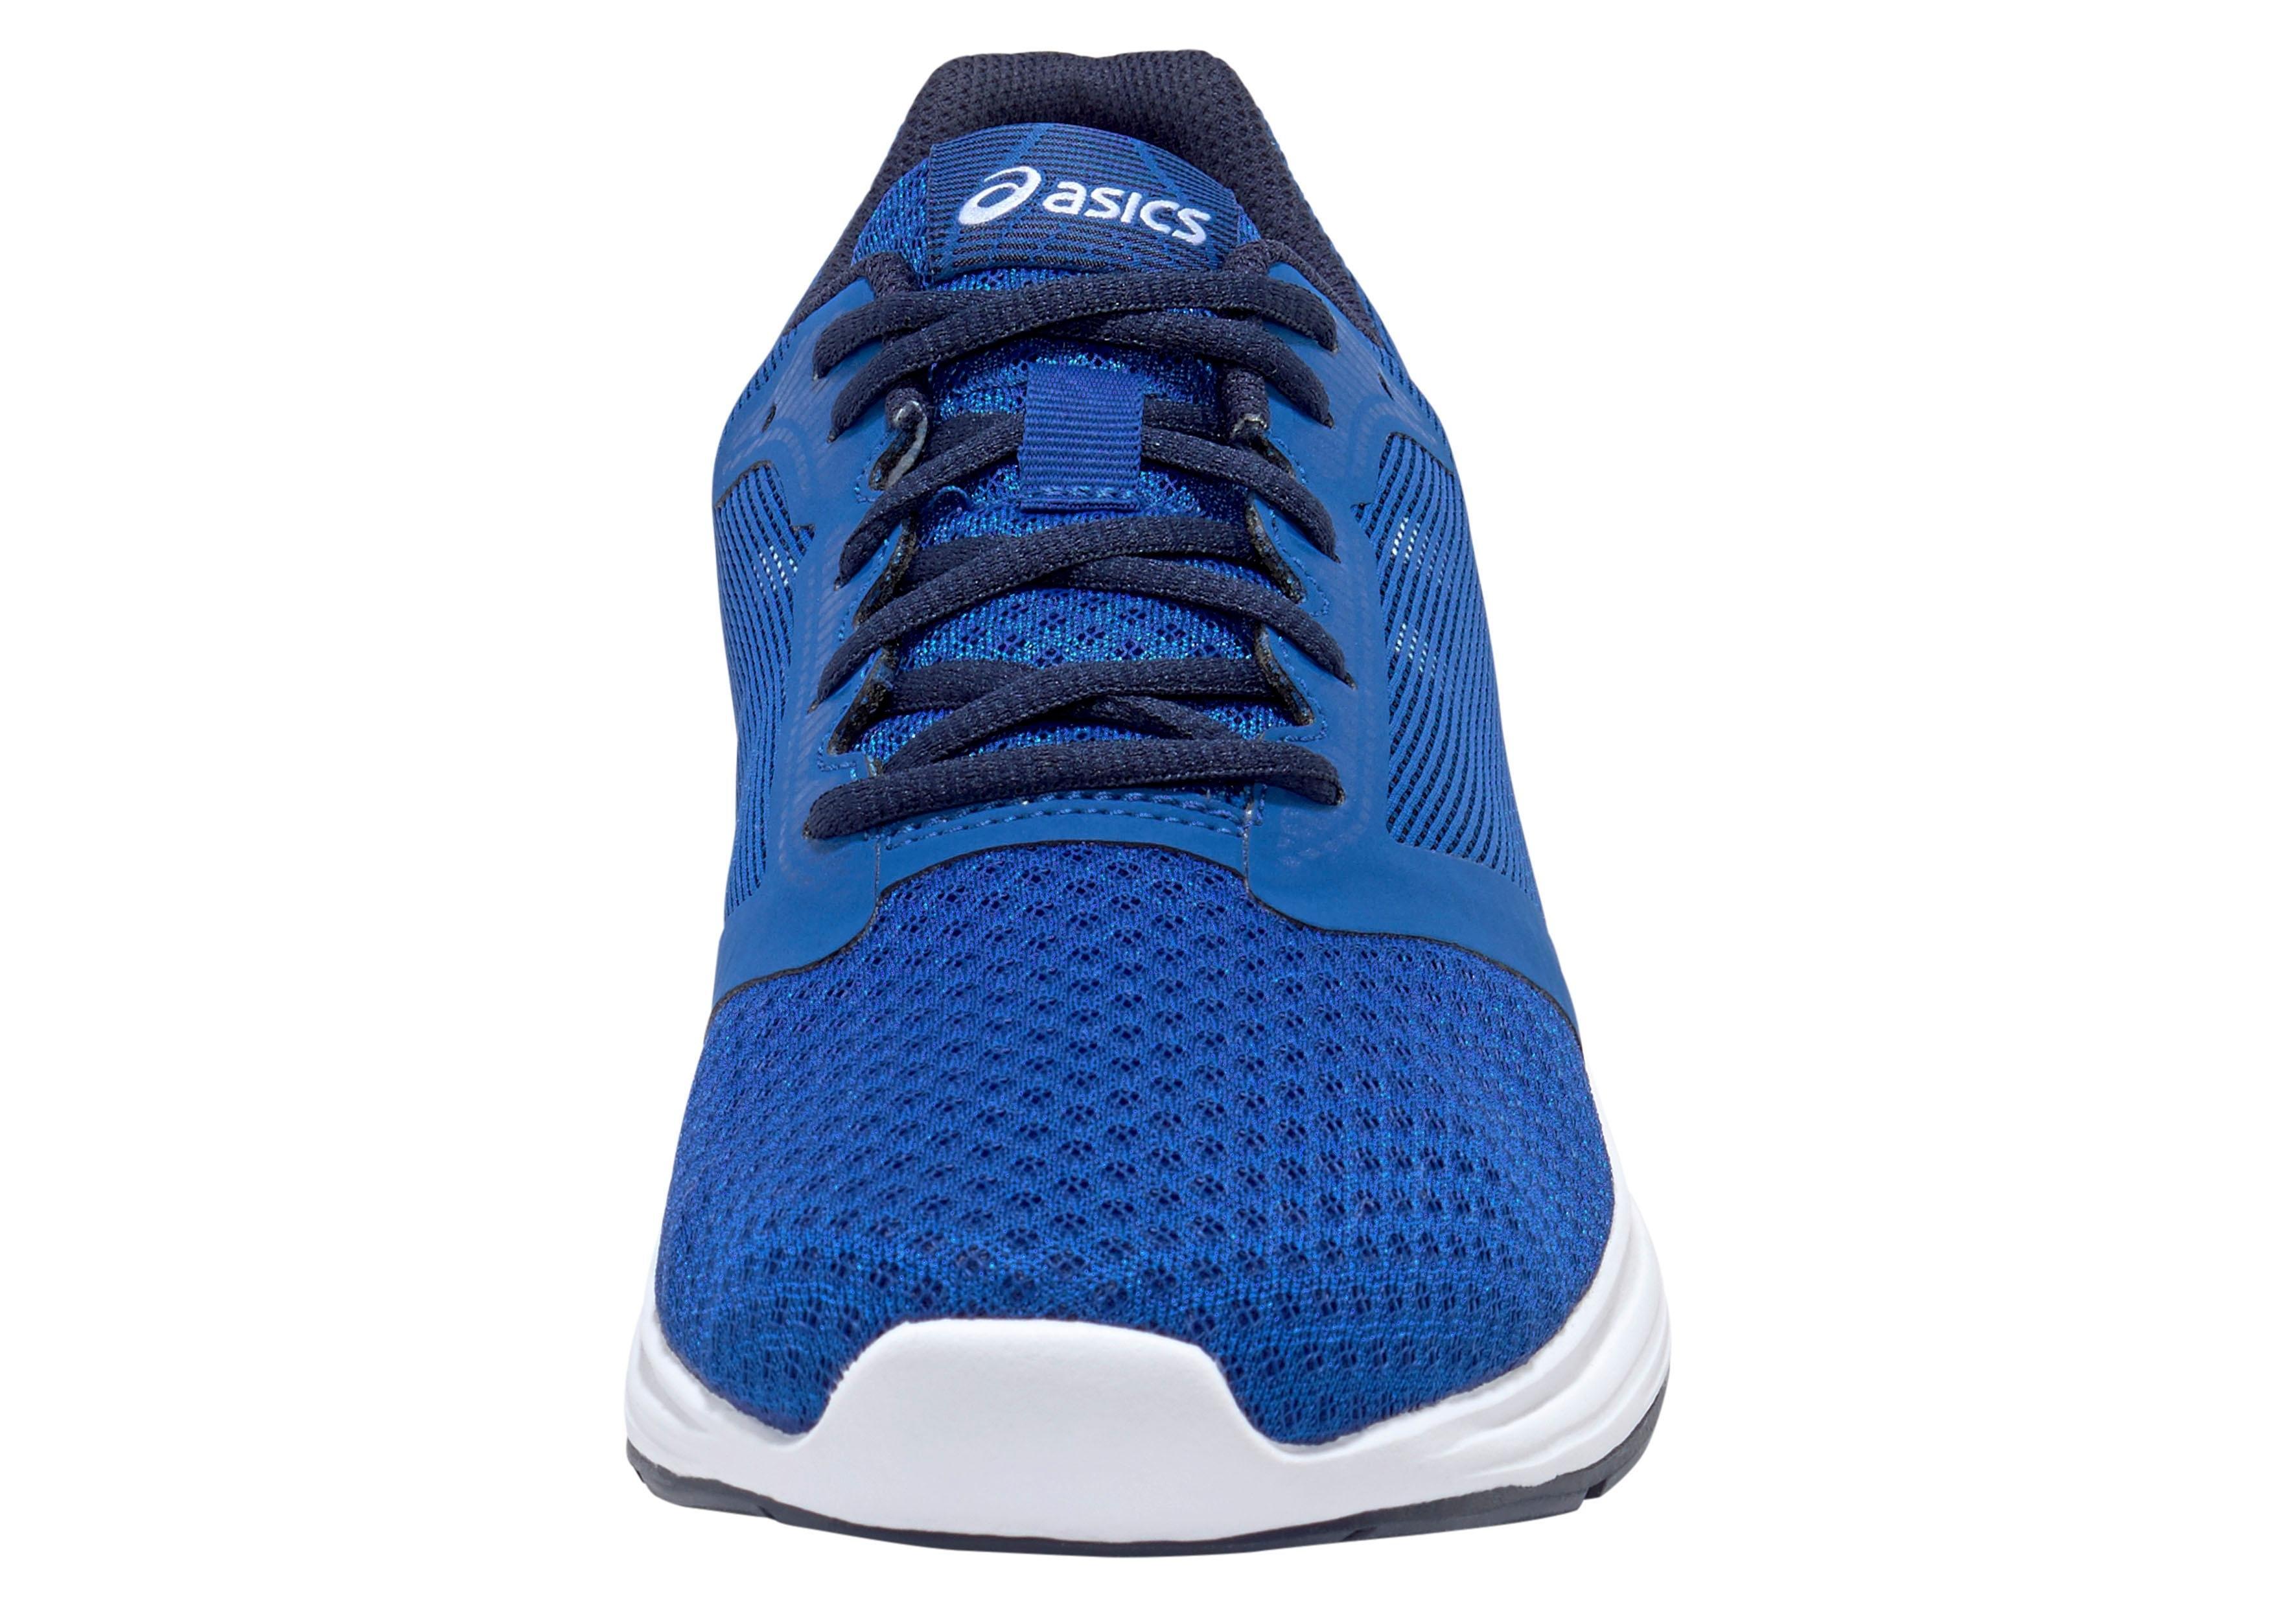 Kopen Runningschoenenpatriot Asics 10 Online 10 Runningschoenenpatriot Asics Online GVSMUpqz